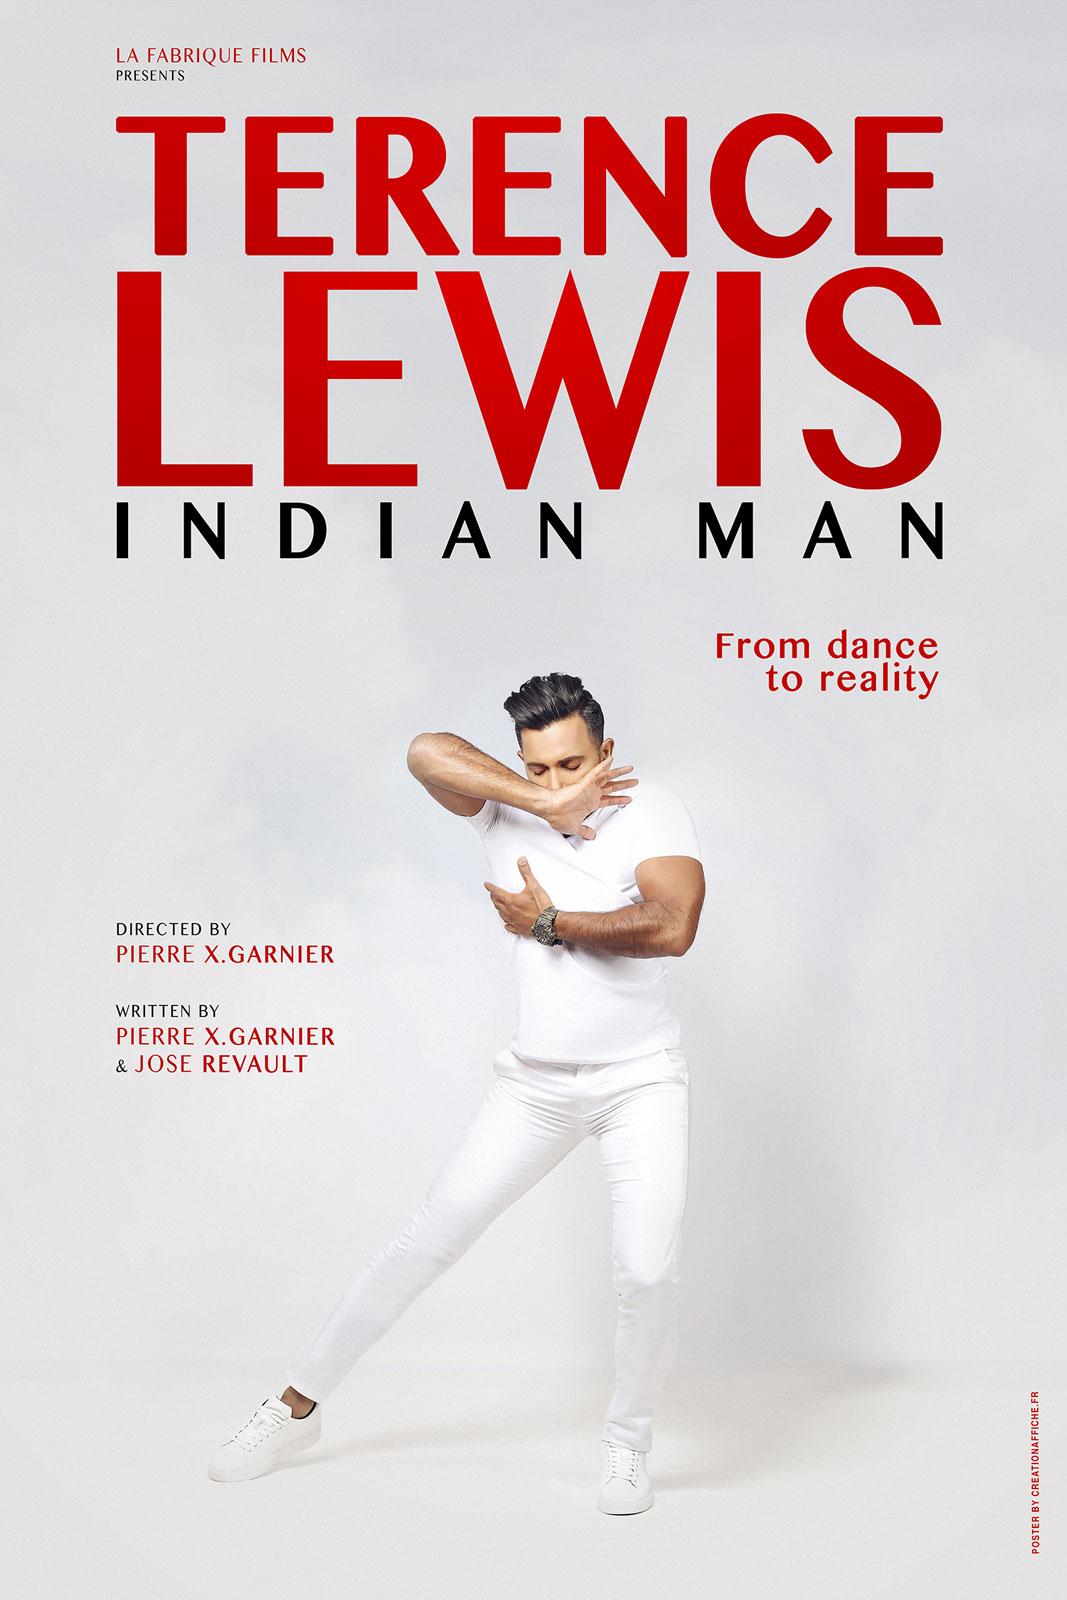 Terence Lewis, Indian Man